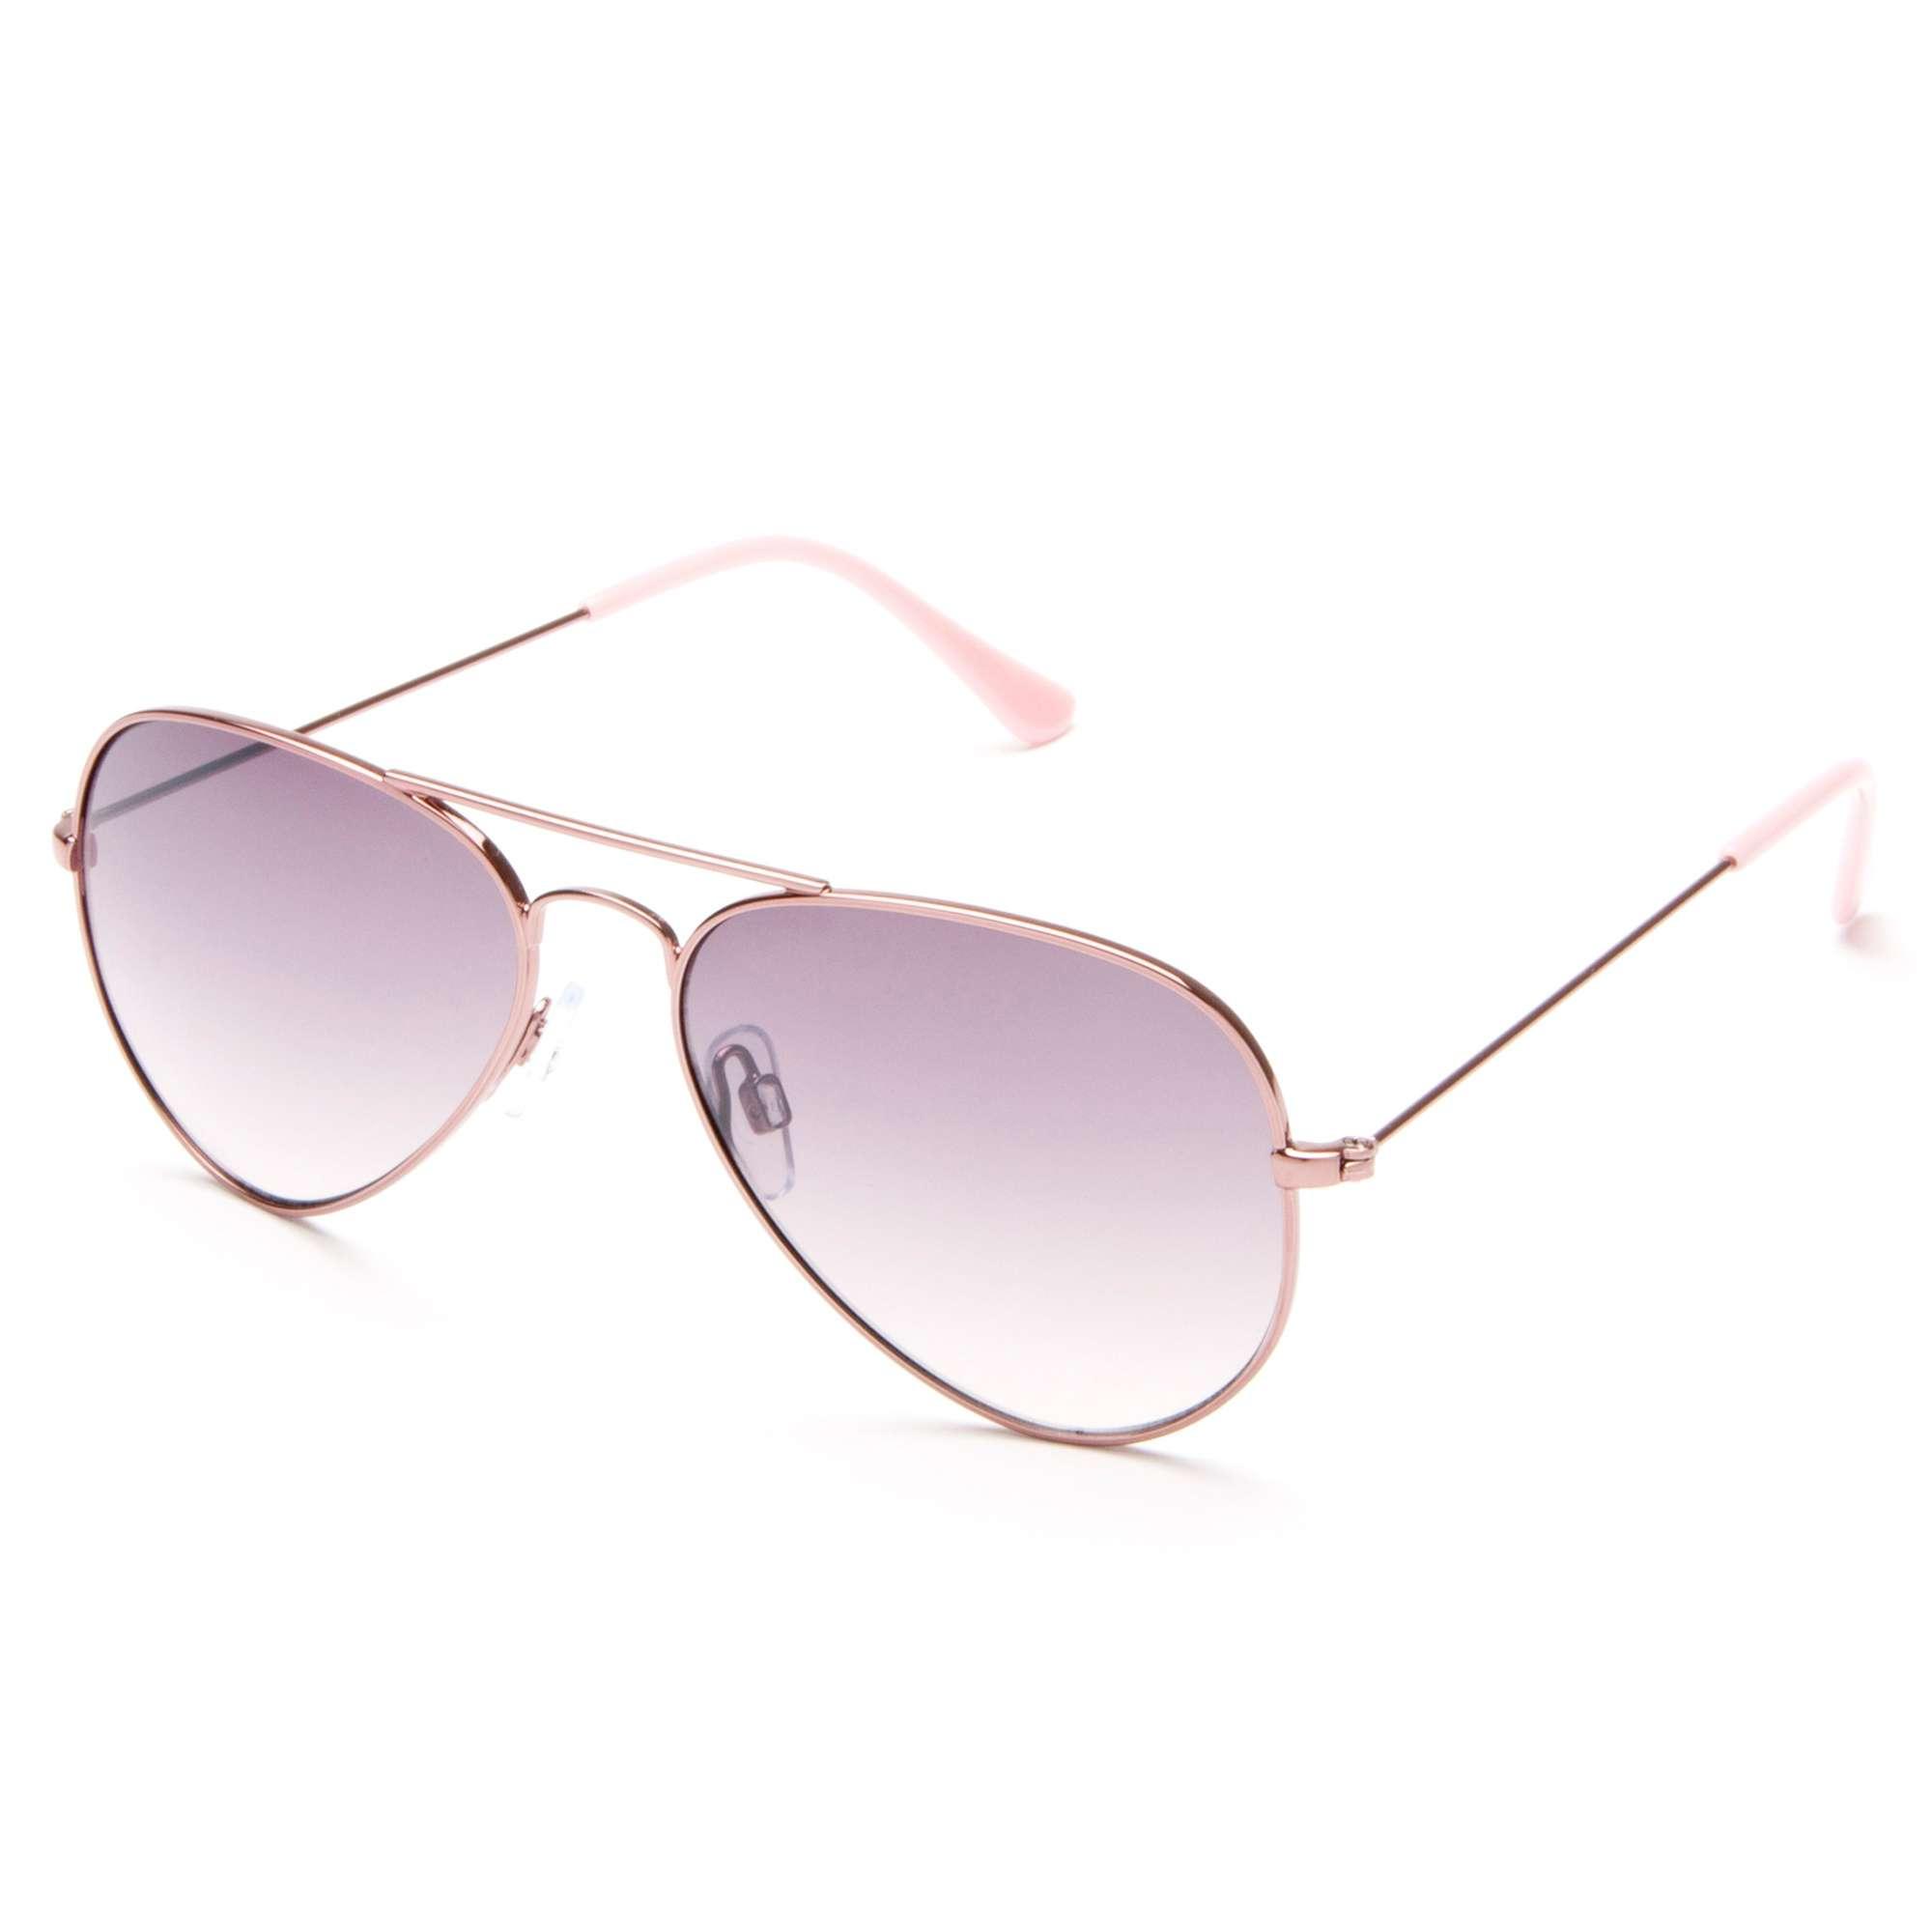 PETER STORM Girl's Classic Aviator Sunglasses